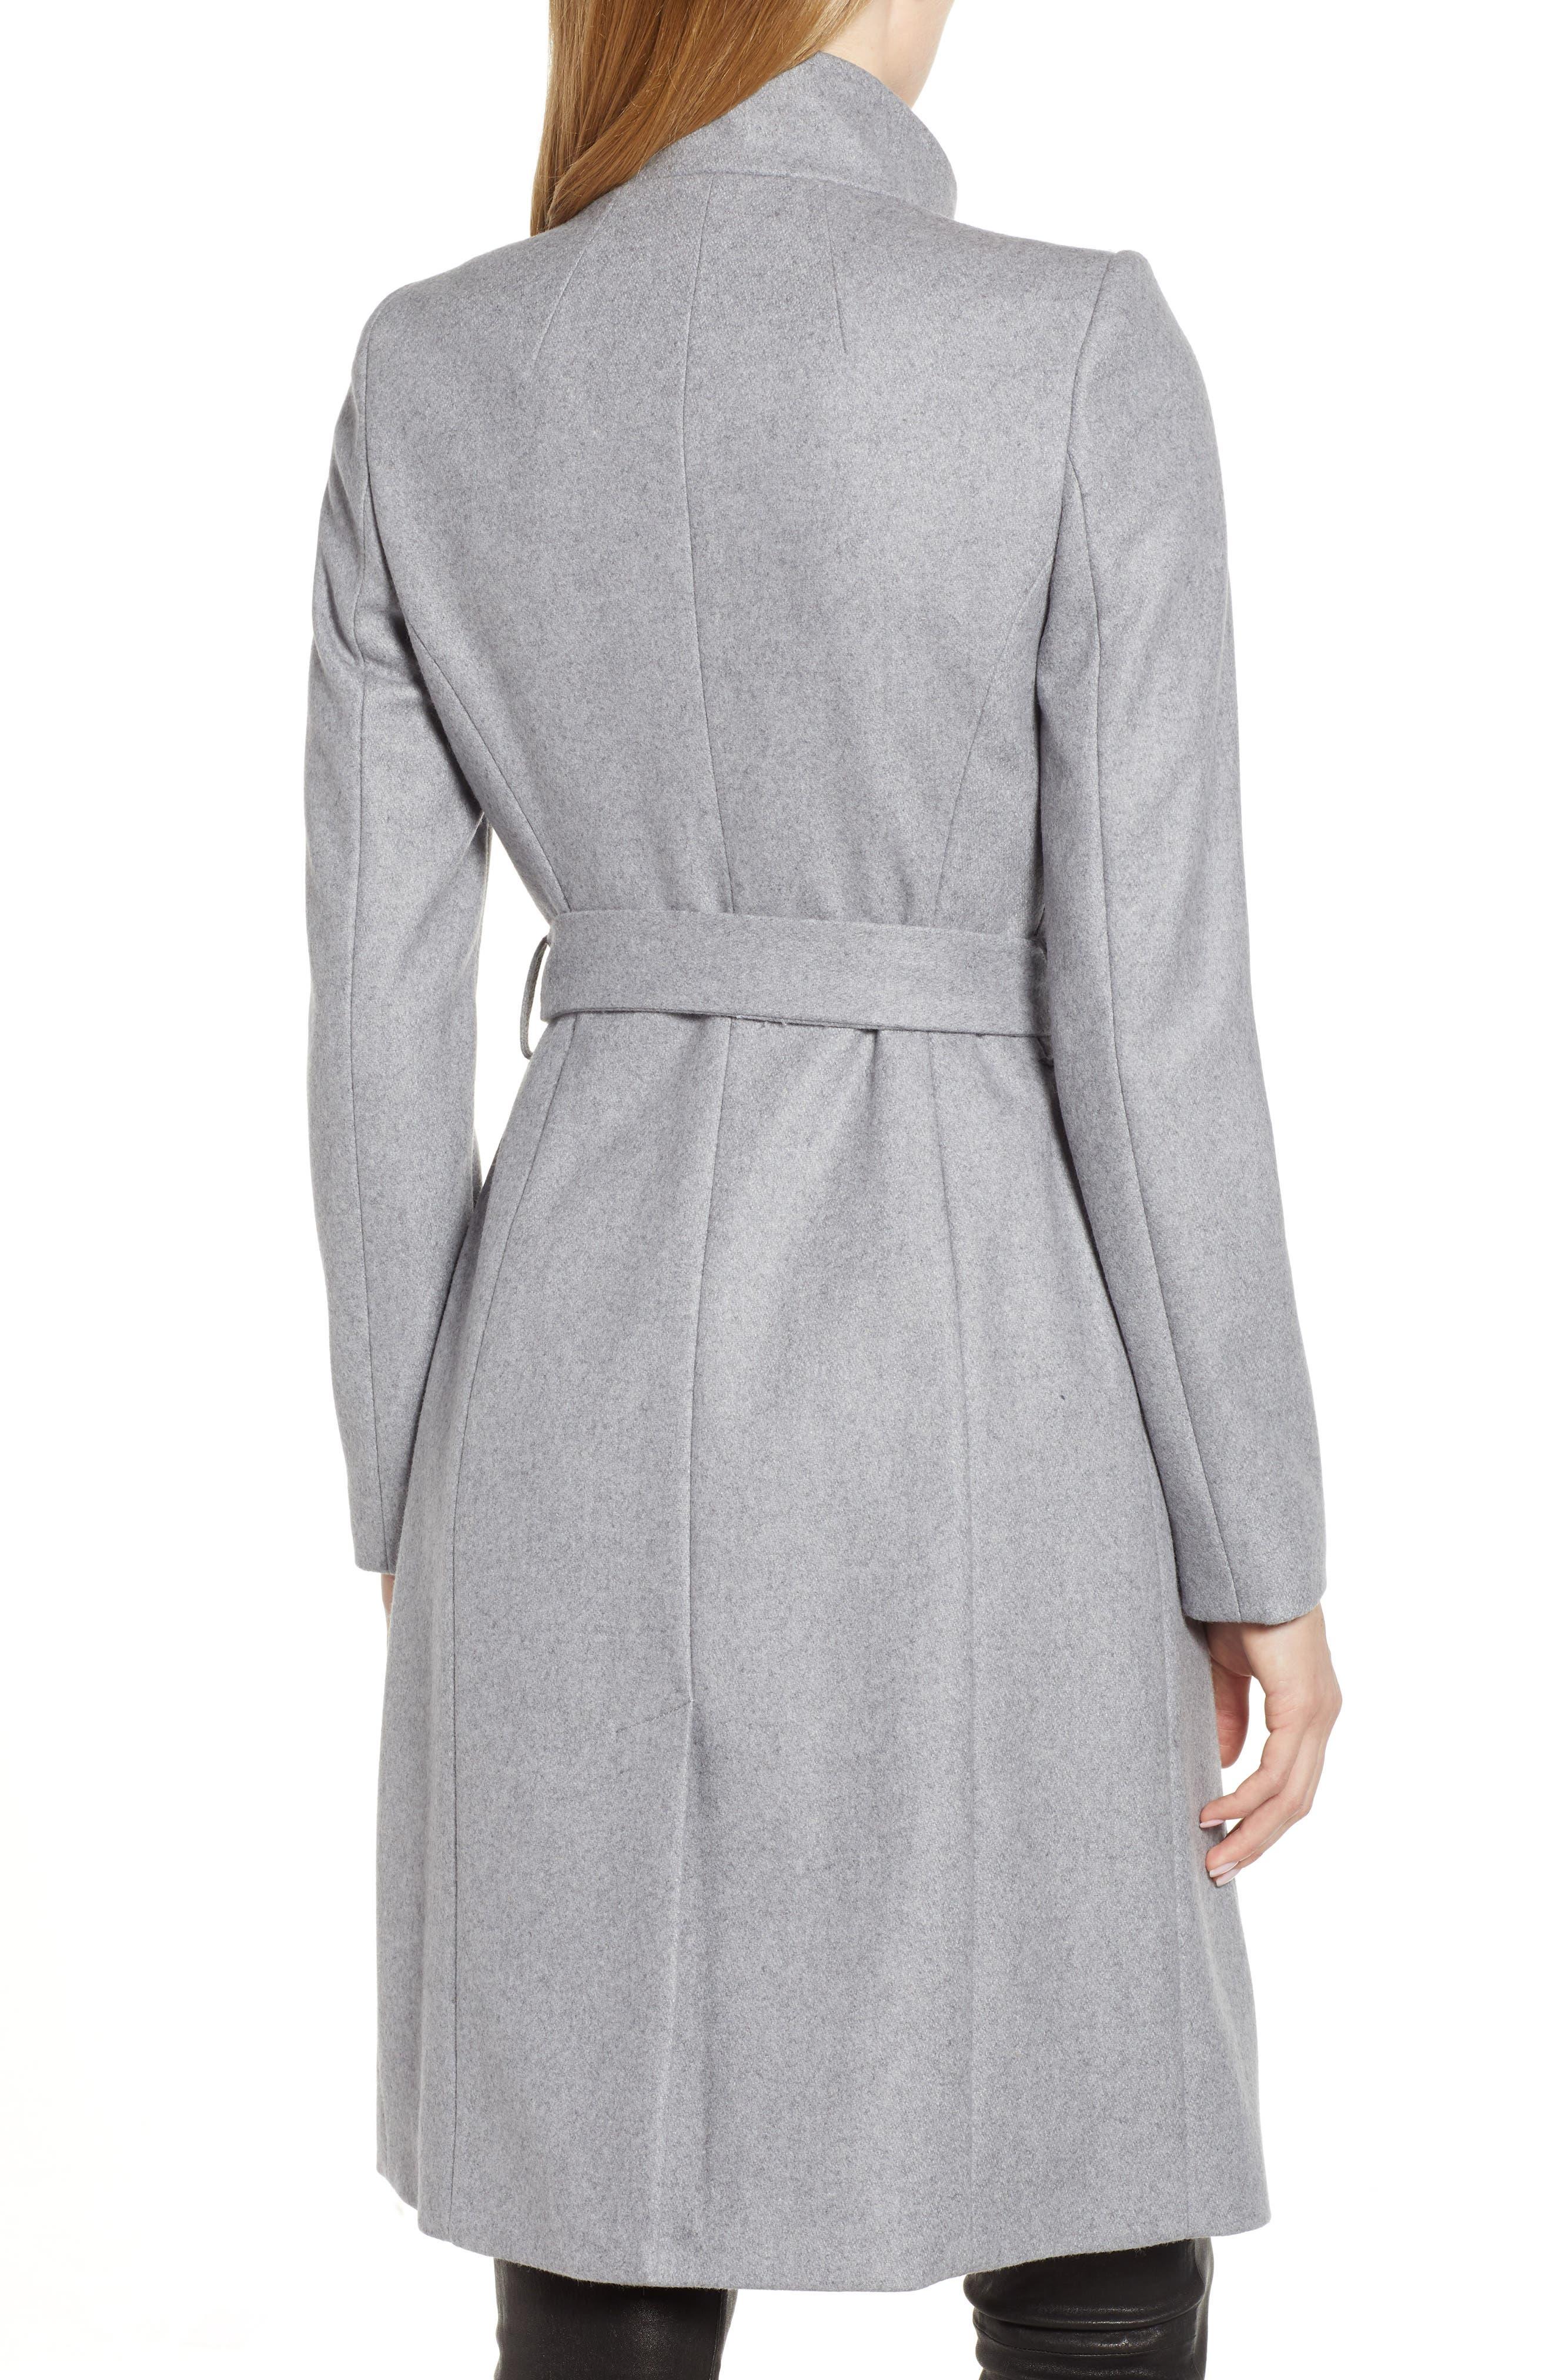 TED BAKER LONDON, Wool Blend Long Wrap Coat, Alternate thumbnail 2, color, 030